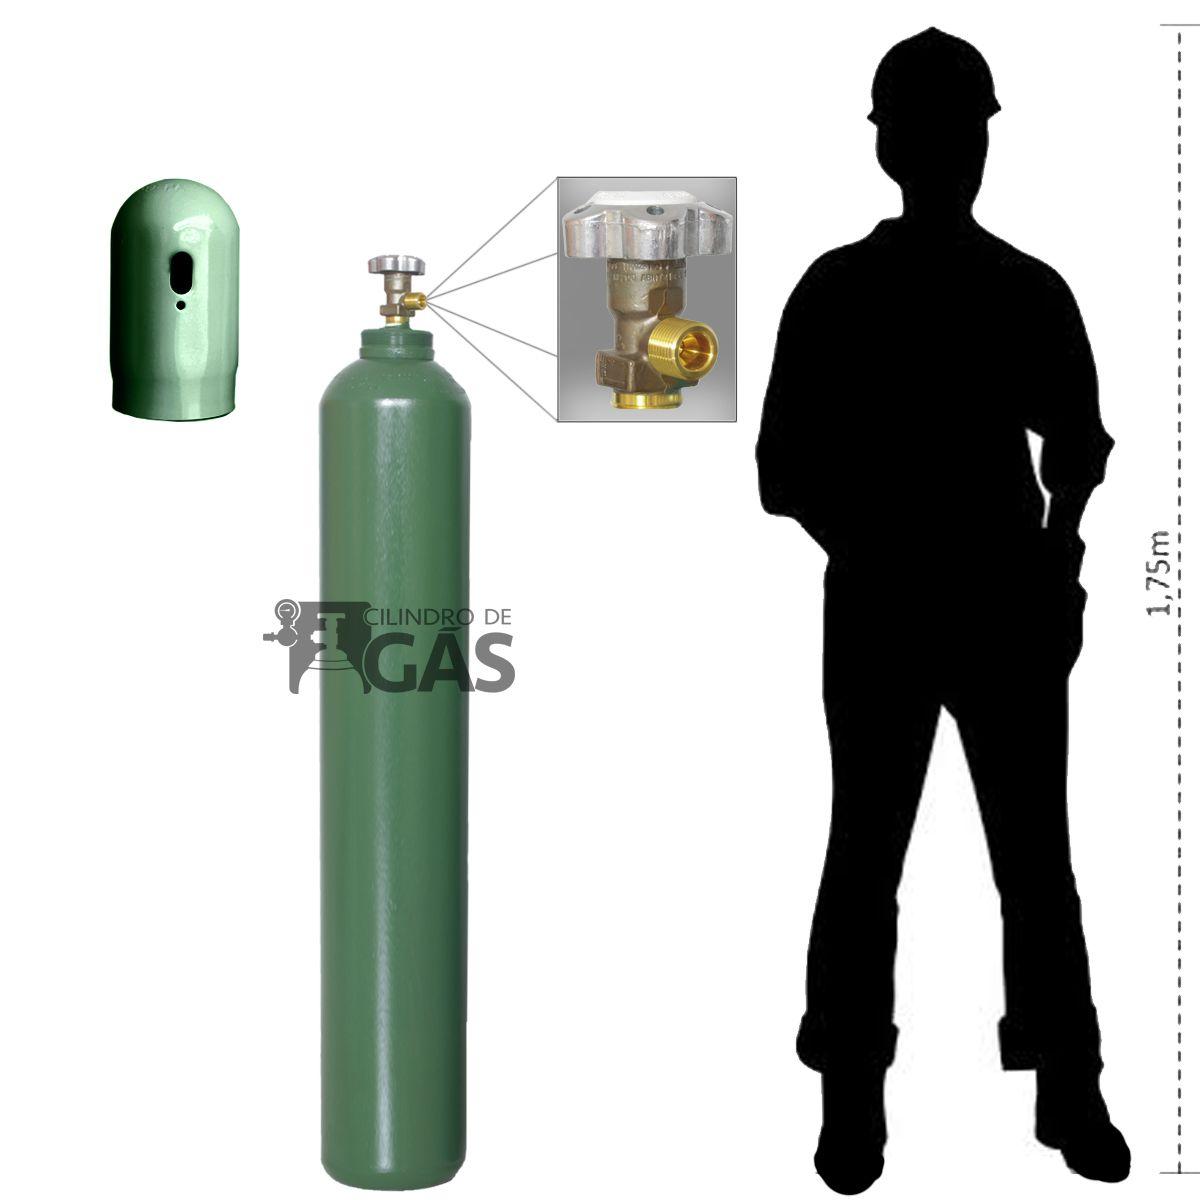 Cilindro para Oxigênio Medicinal - 40L